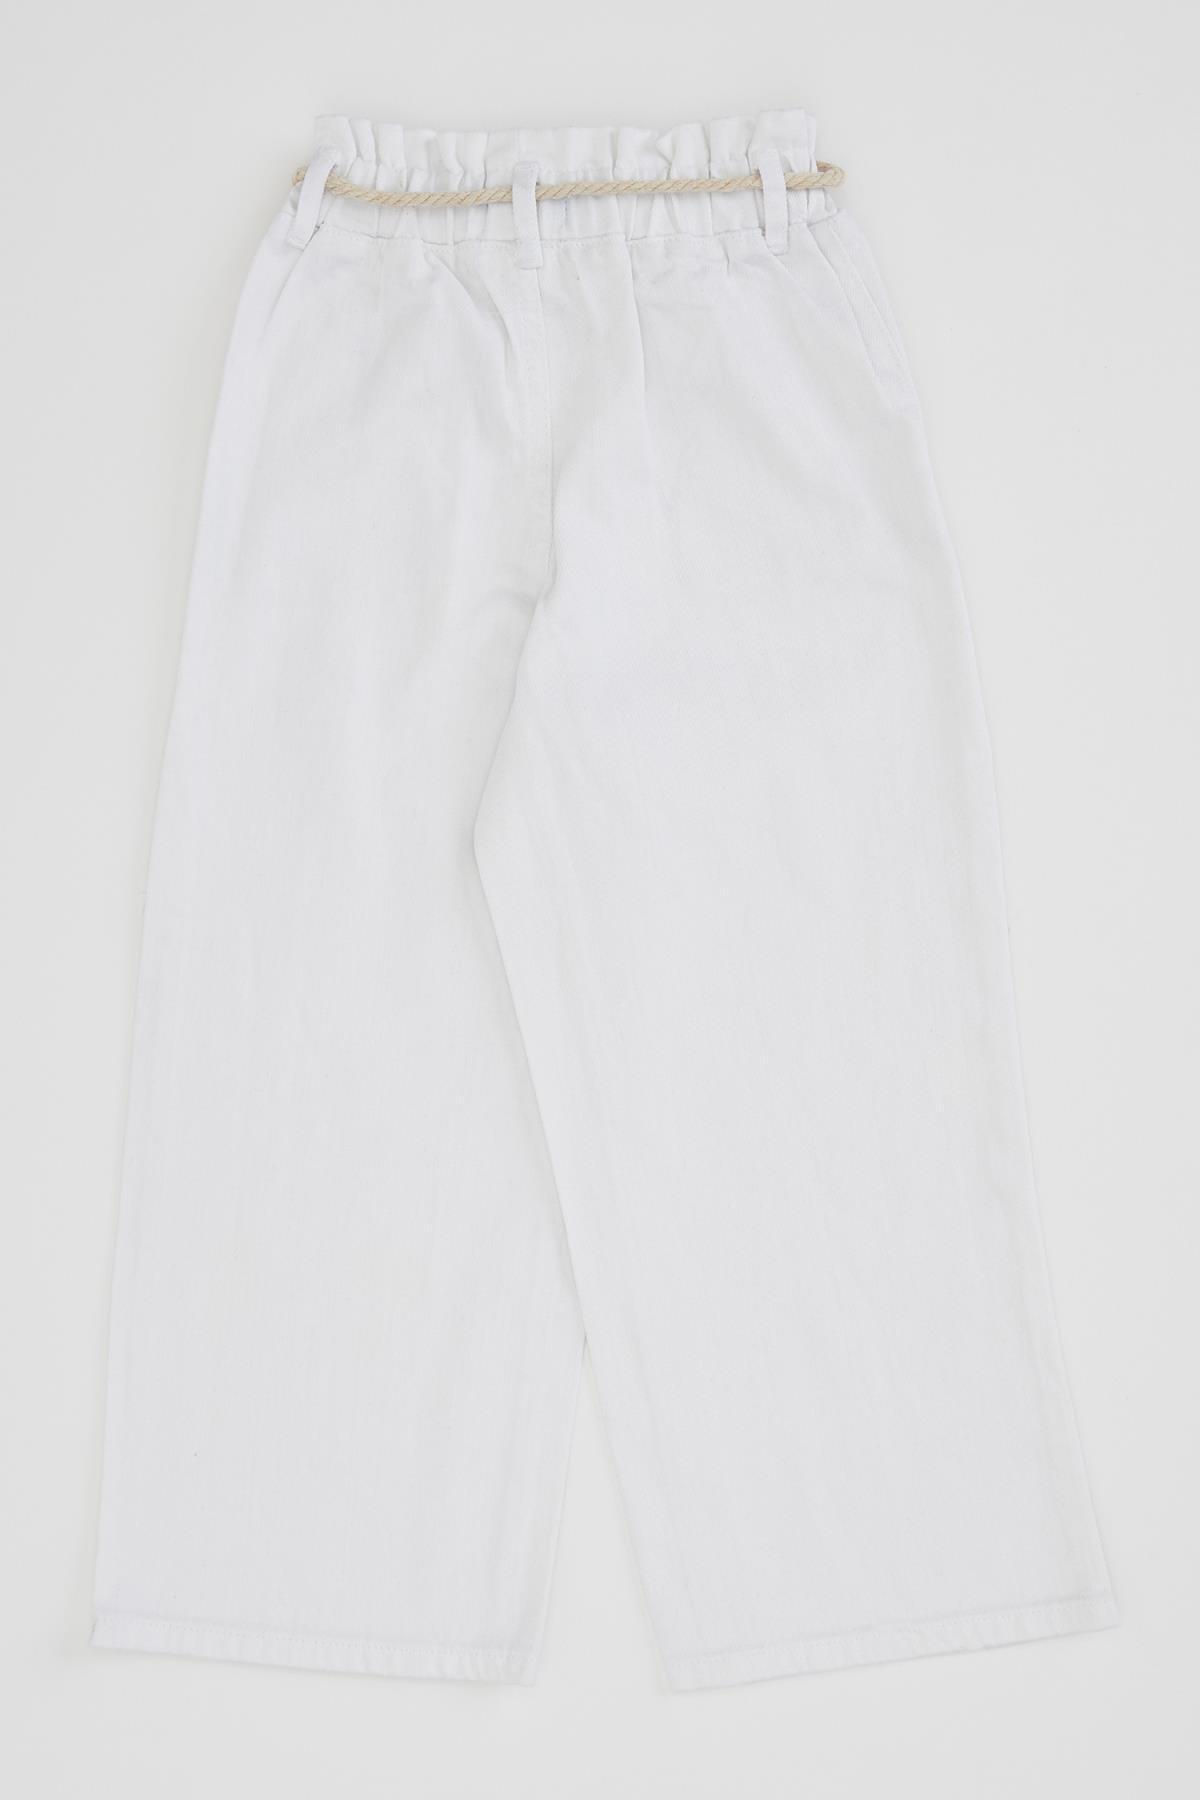 Defacto Kız Çocuk Geniş Paça Beyaz Jean Pantolon 4